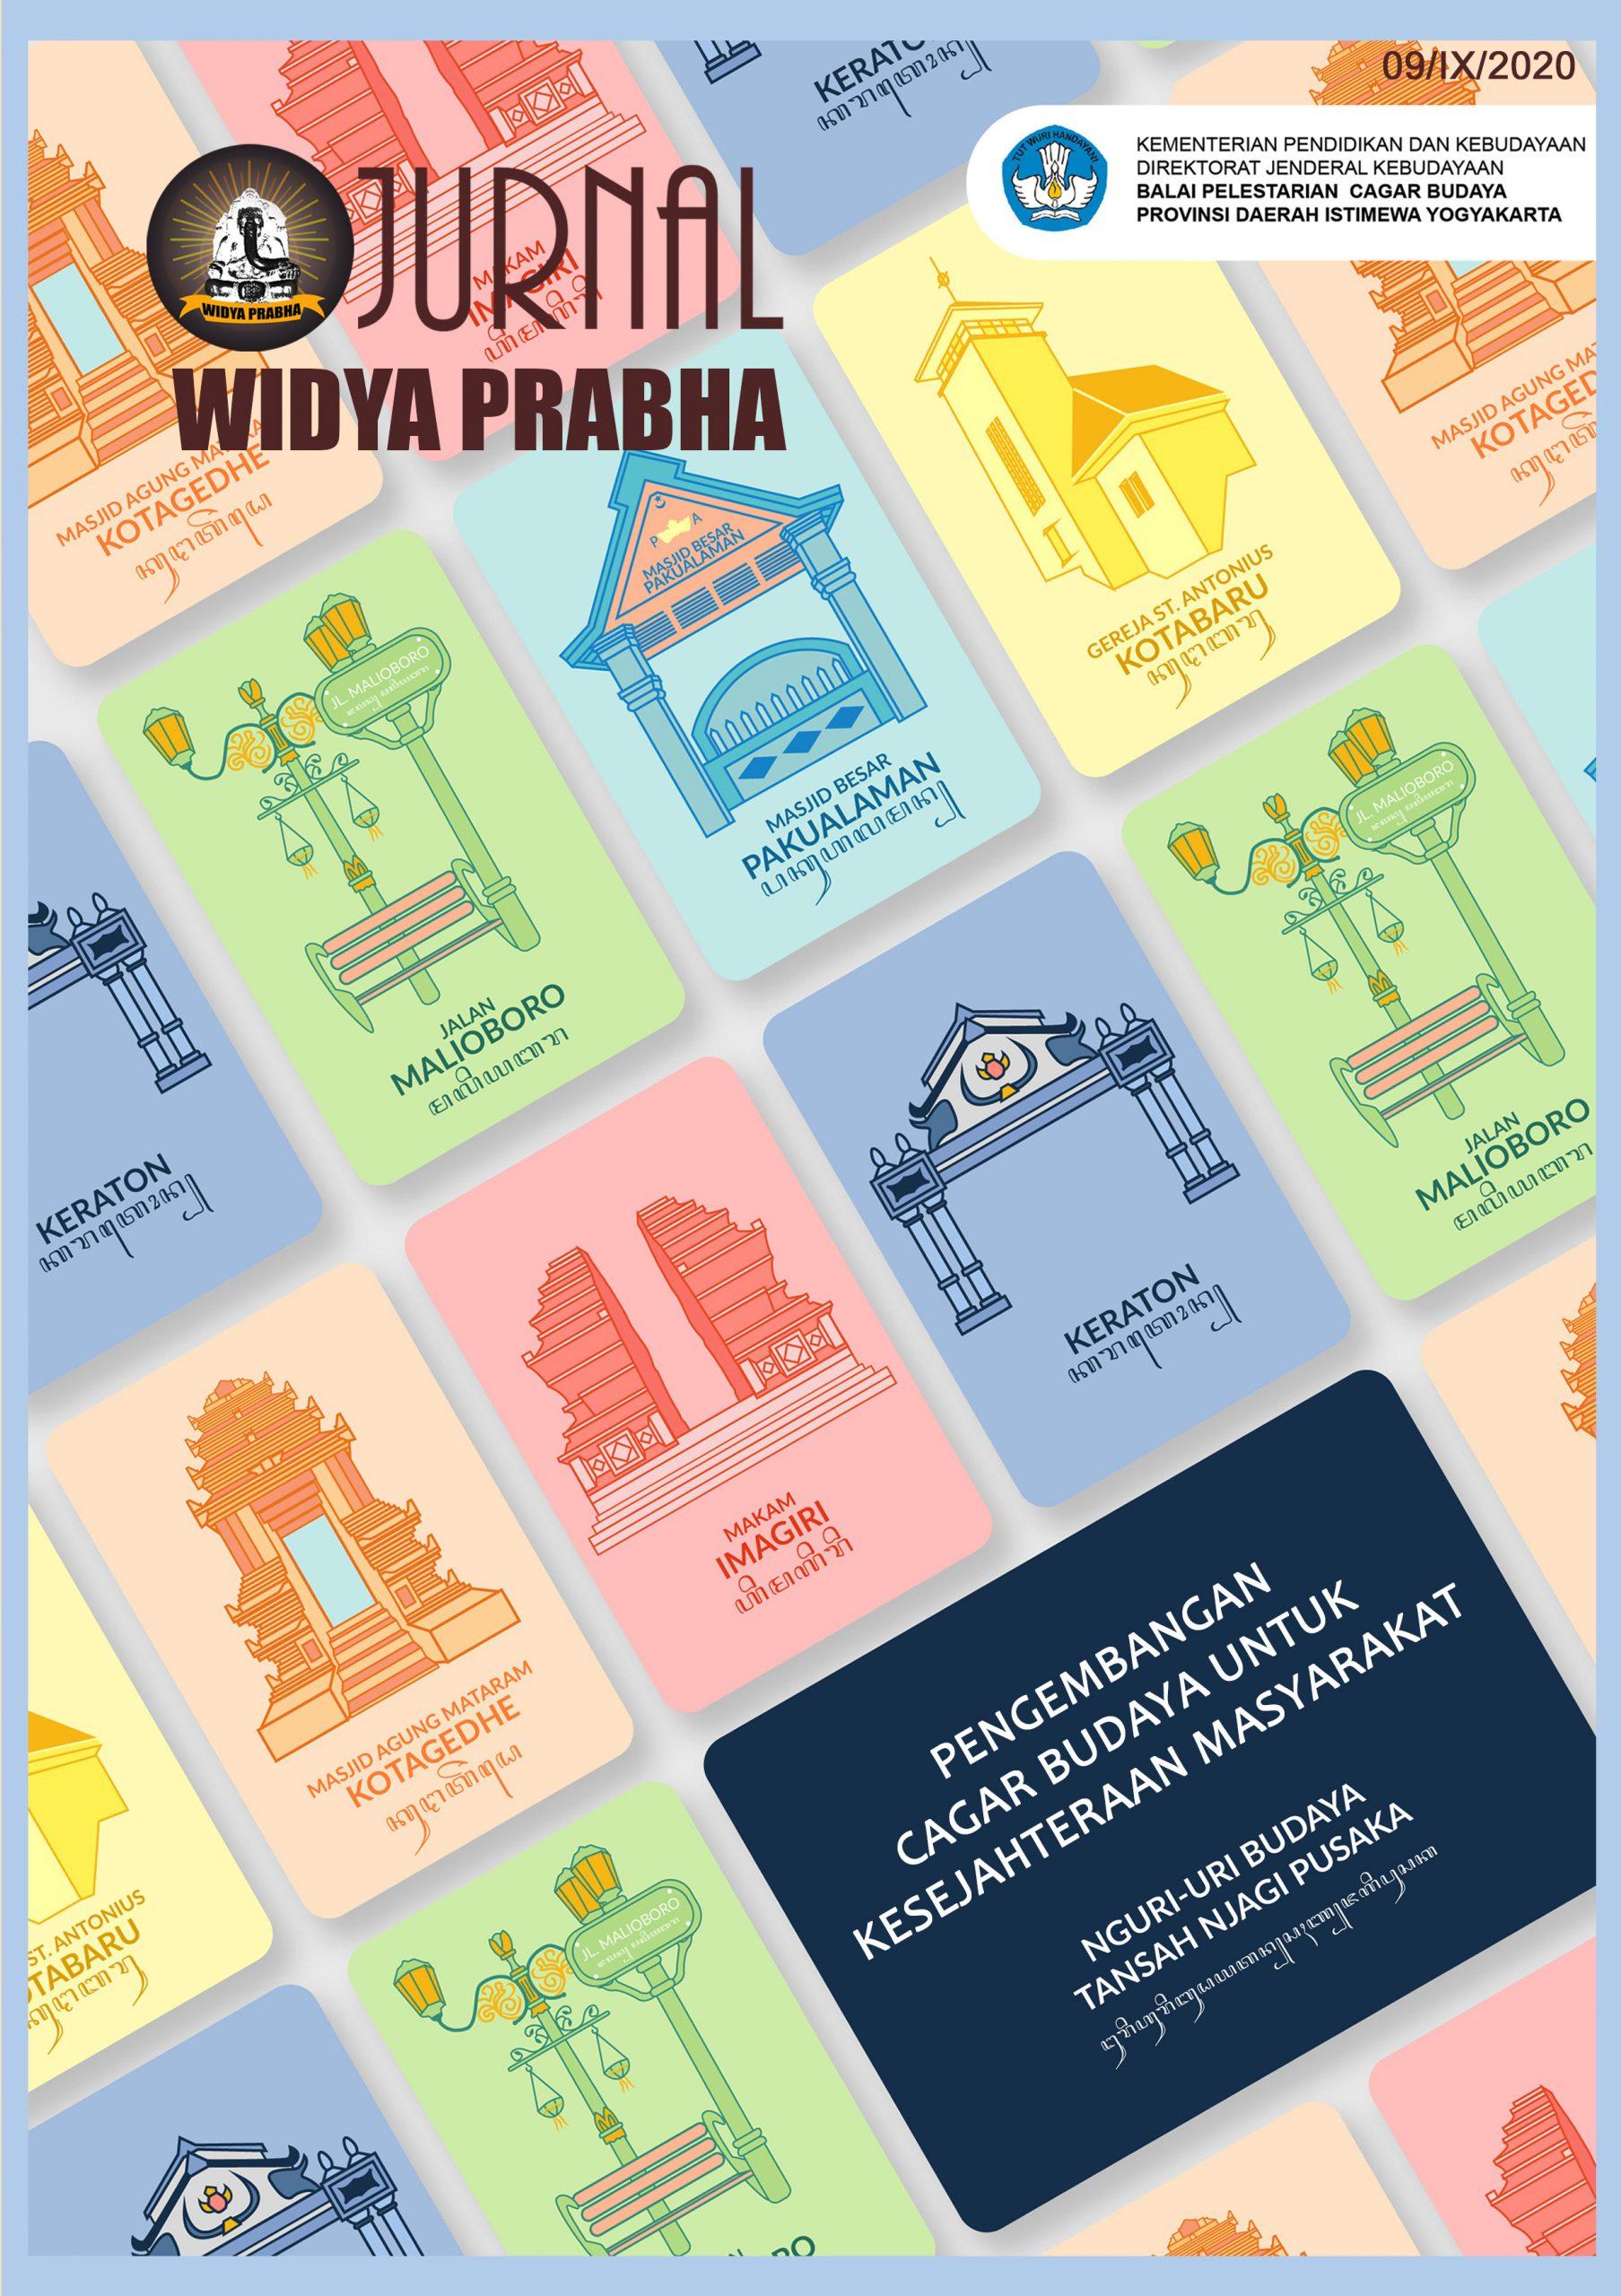 Read more about the article Jurnal Widya Prabha No. 09/IX/2020